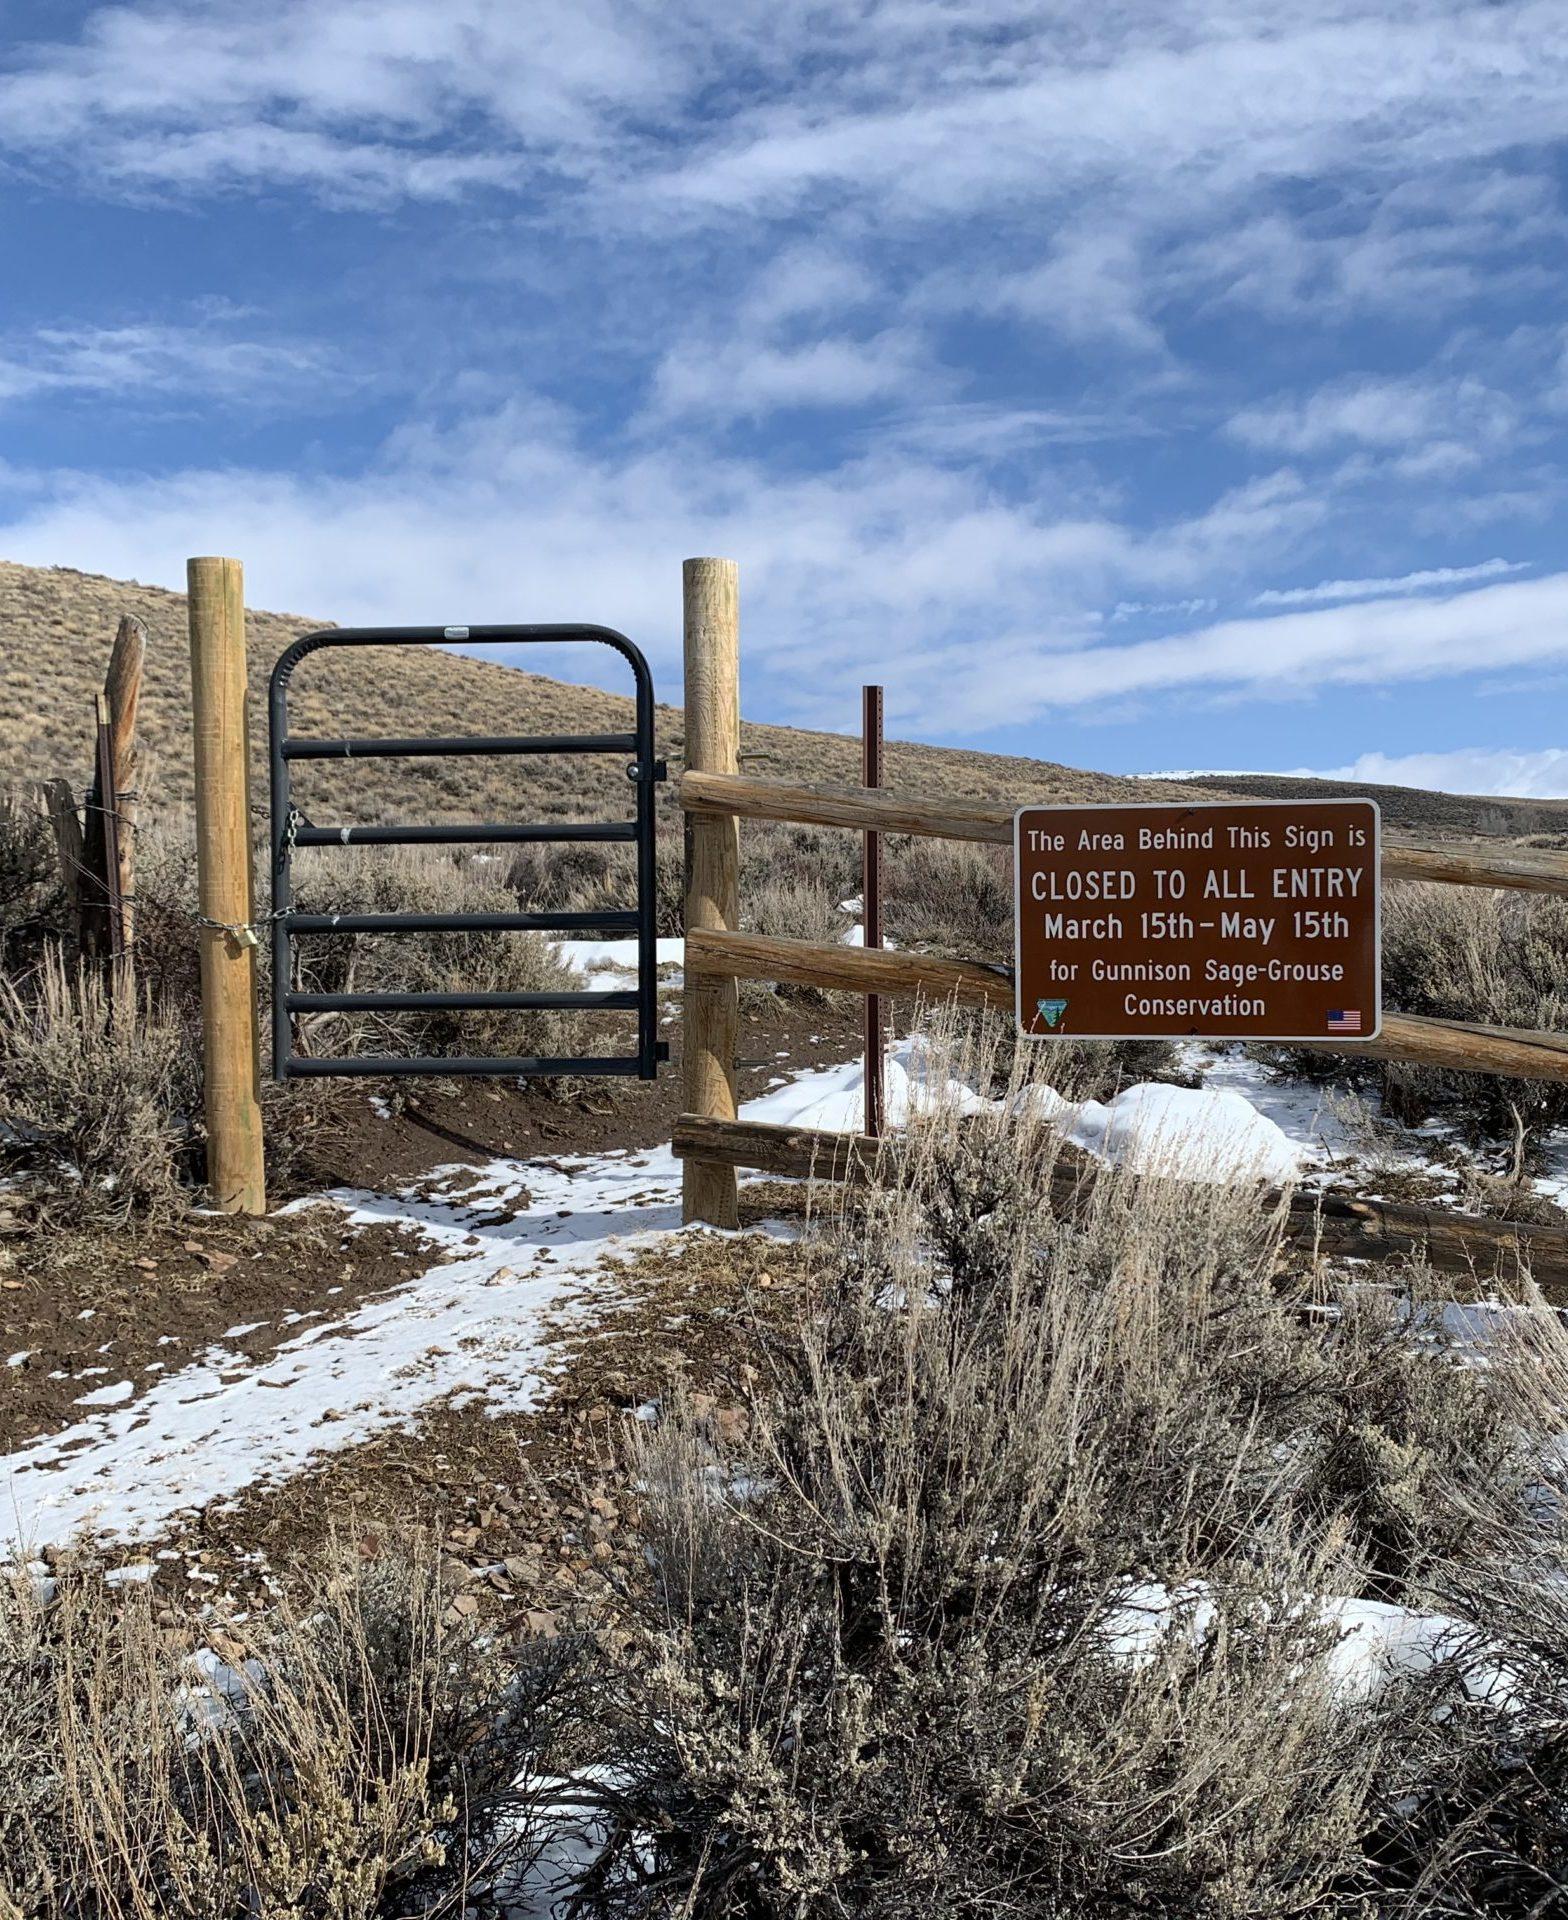 Spring Trail Closures Begin March 15